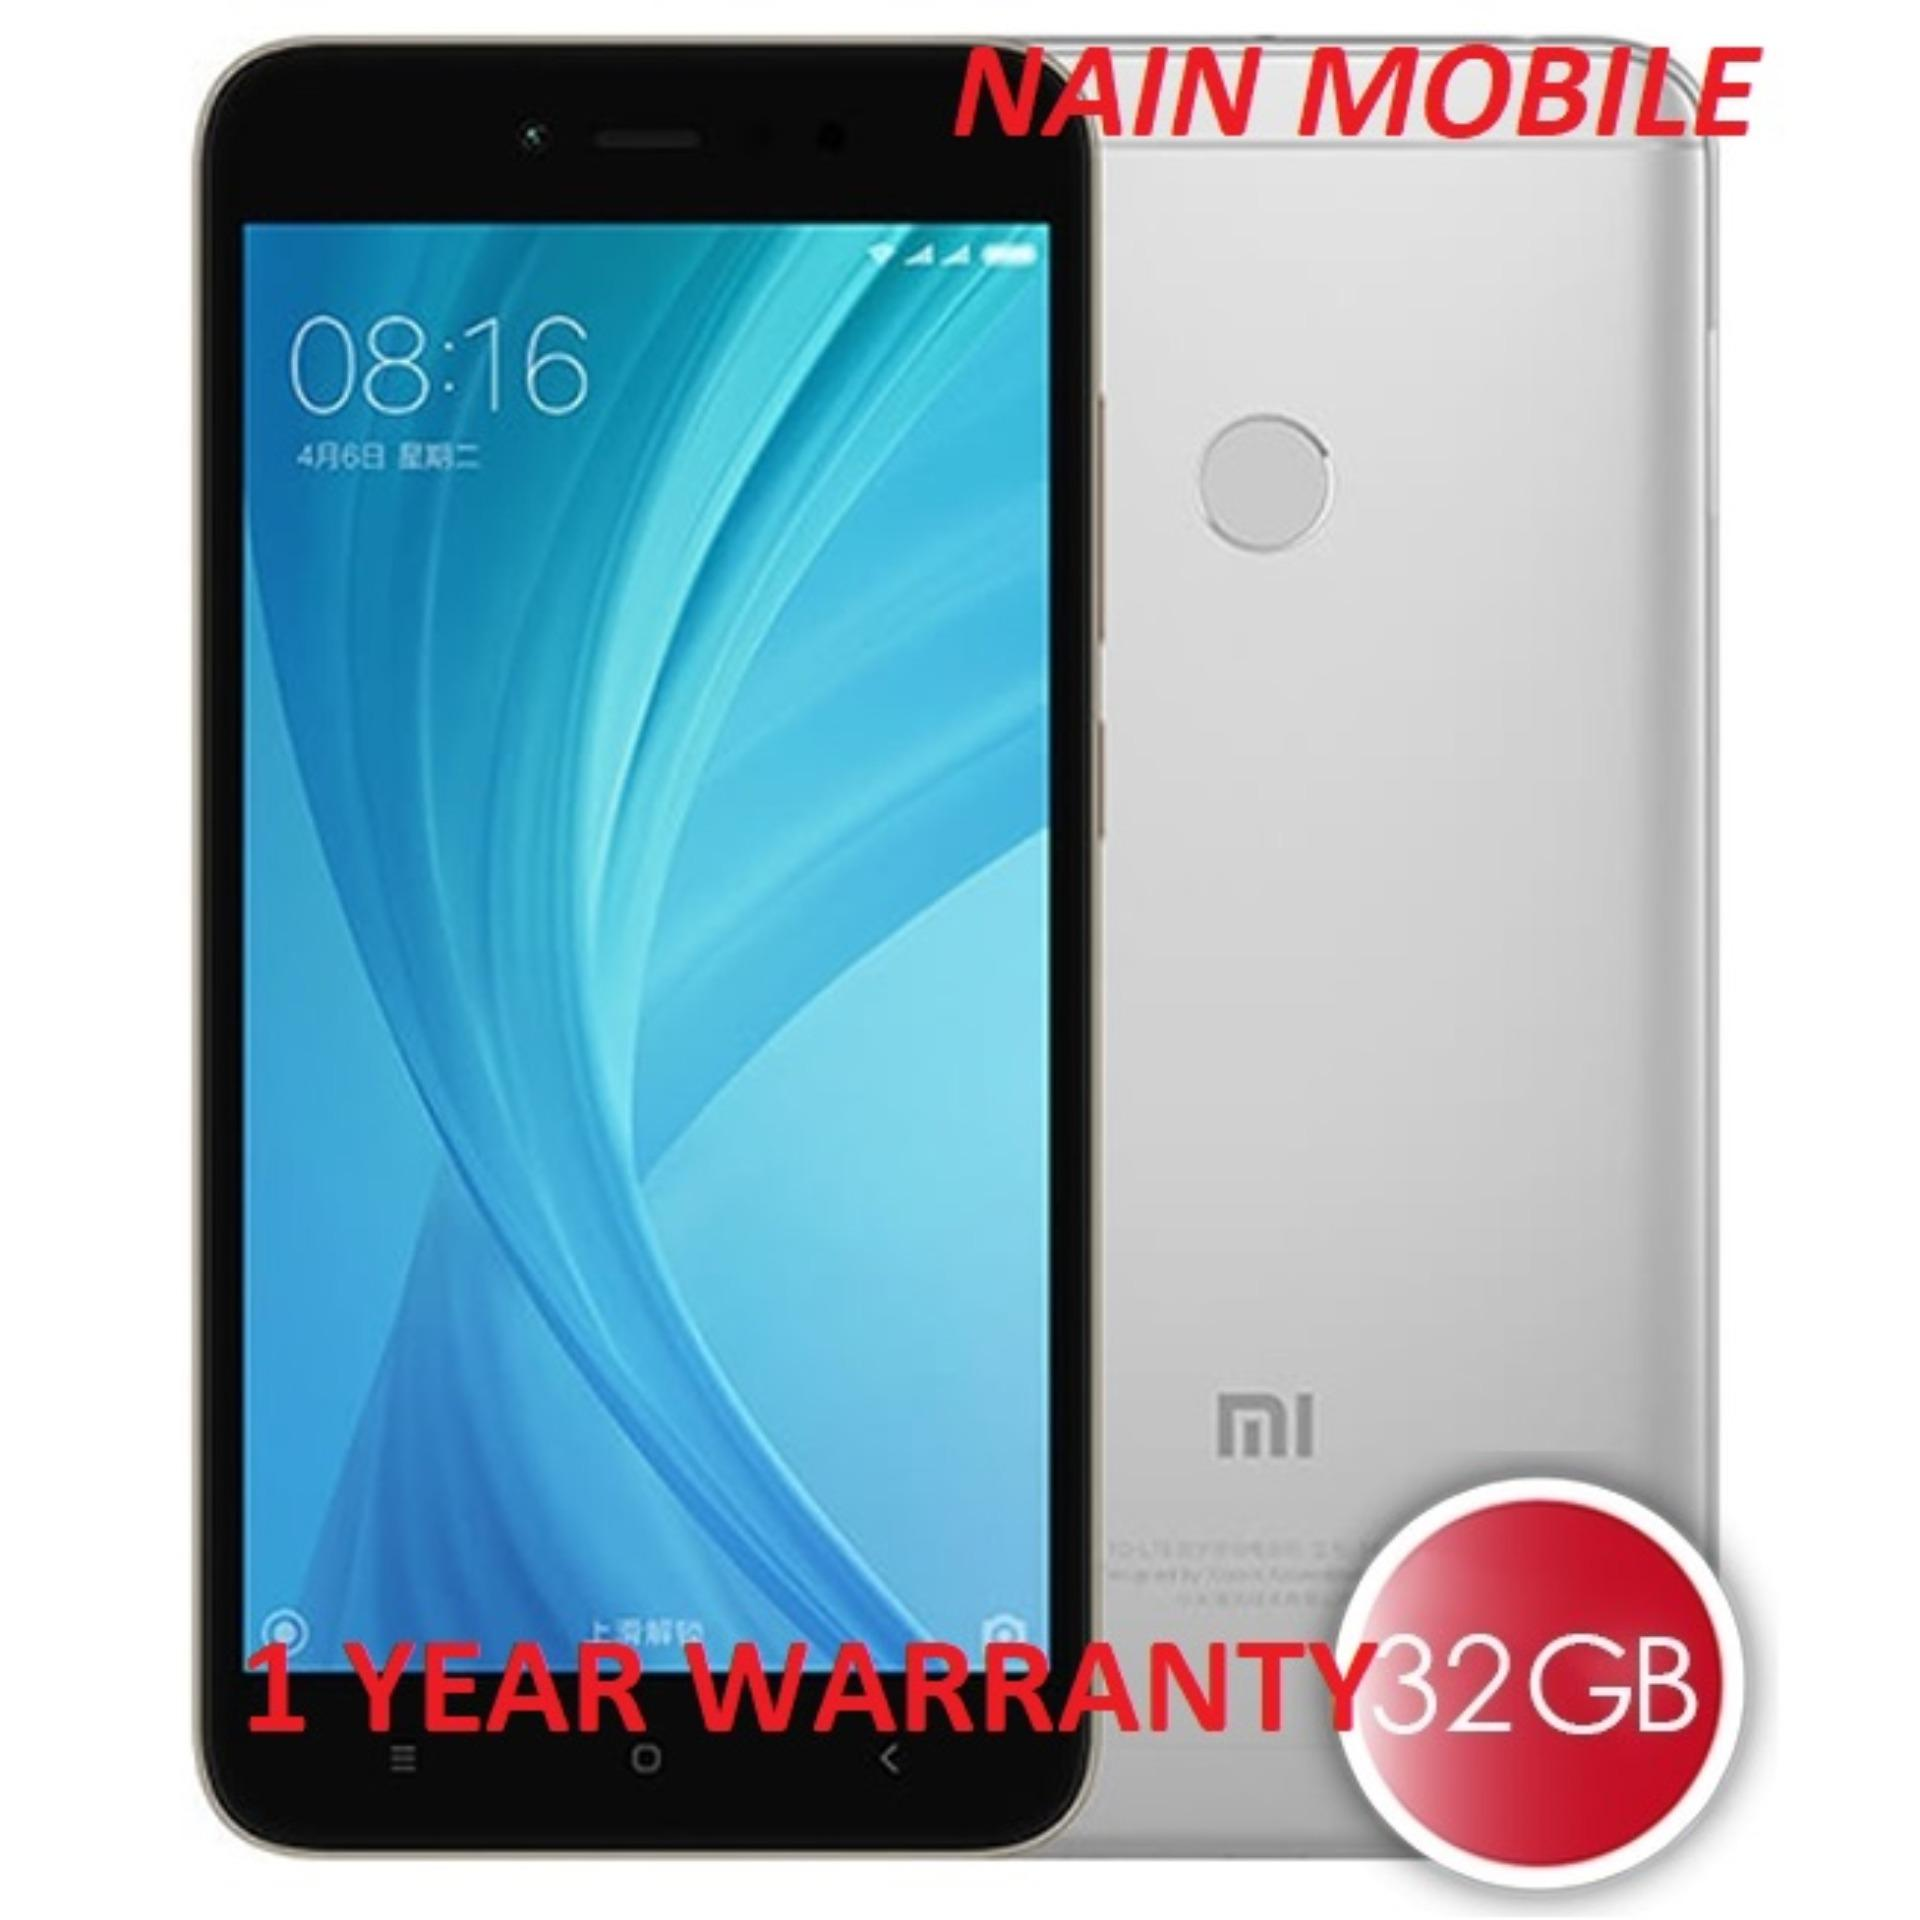 Xiaomi Redmi Note 5A Prime 3GB Ram 32GB (1 YEAR WARRANTY)